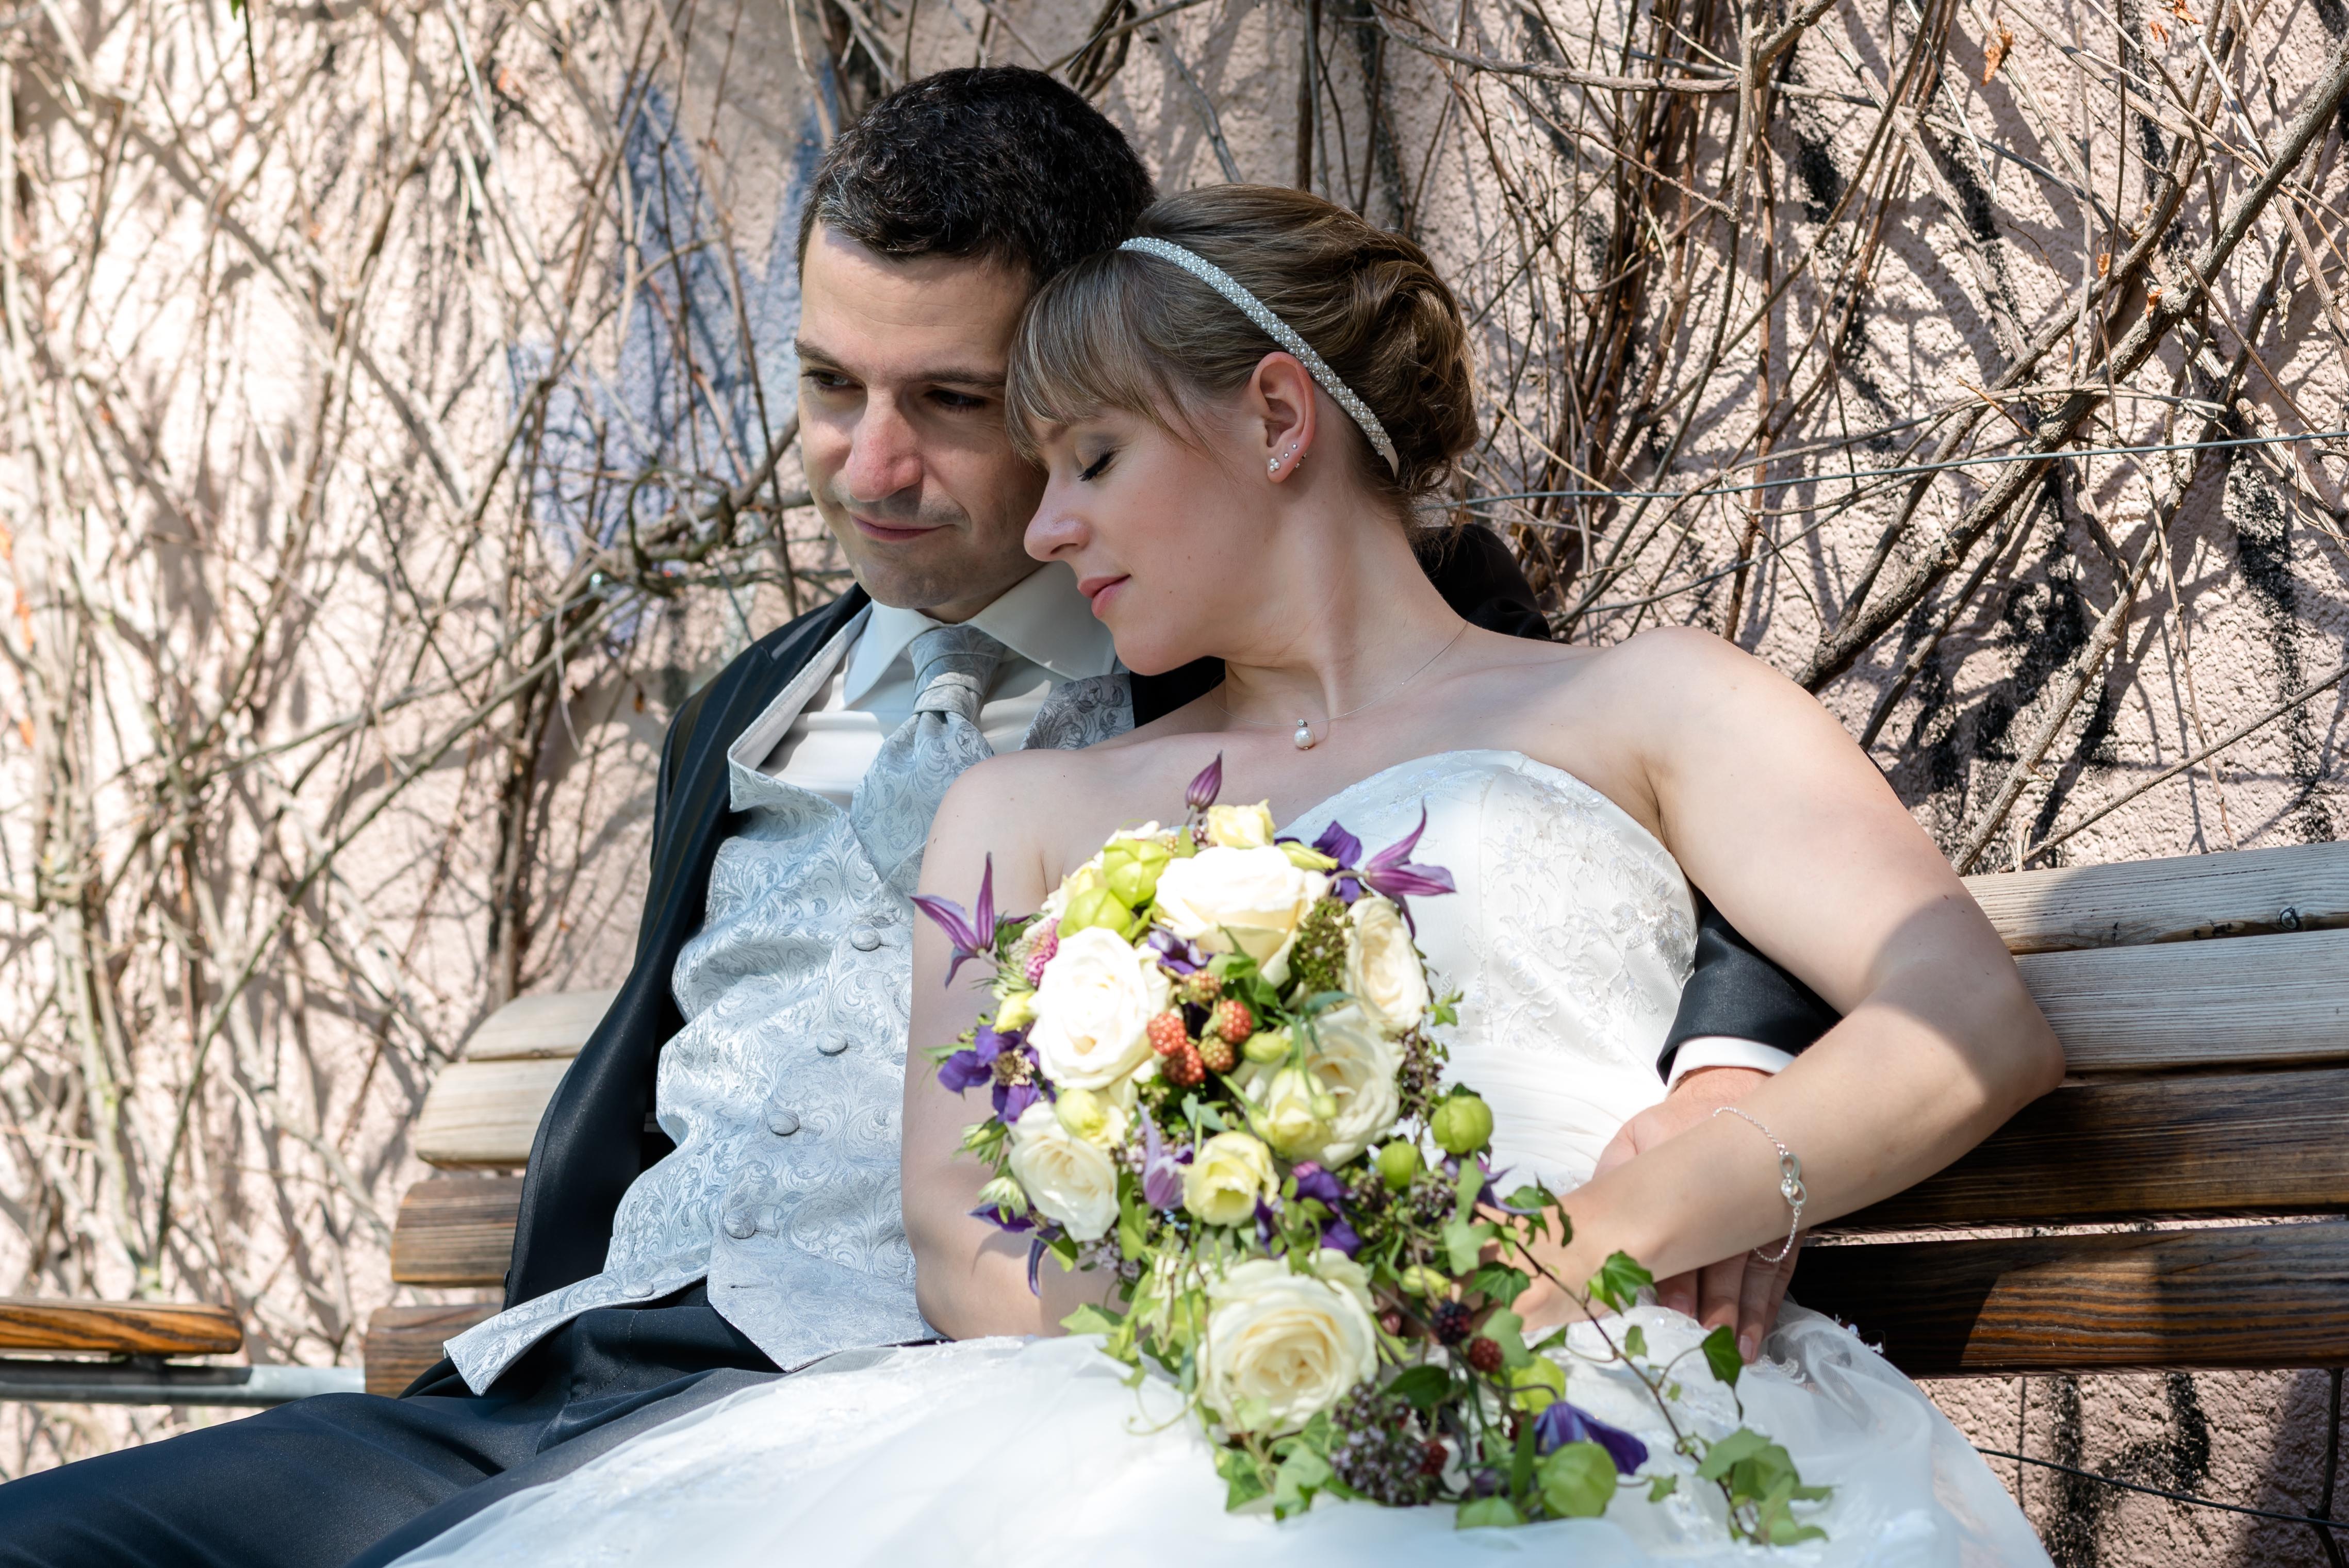 Ruhe vor dem Sturm der Ehe